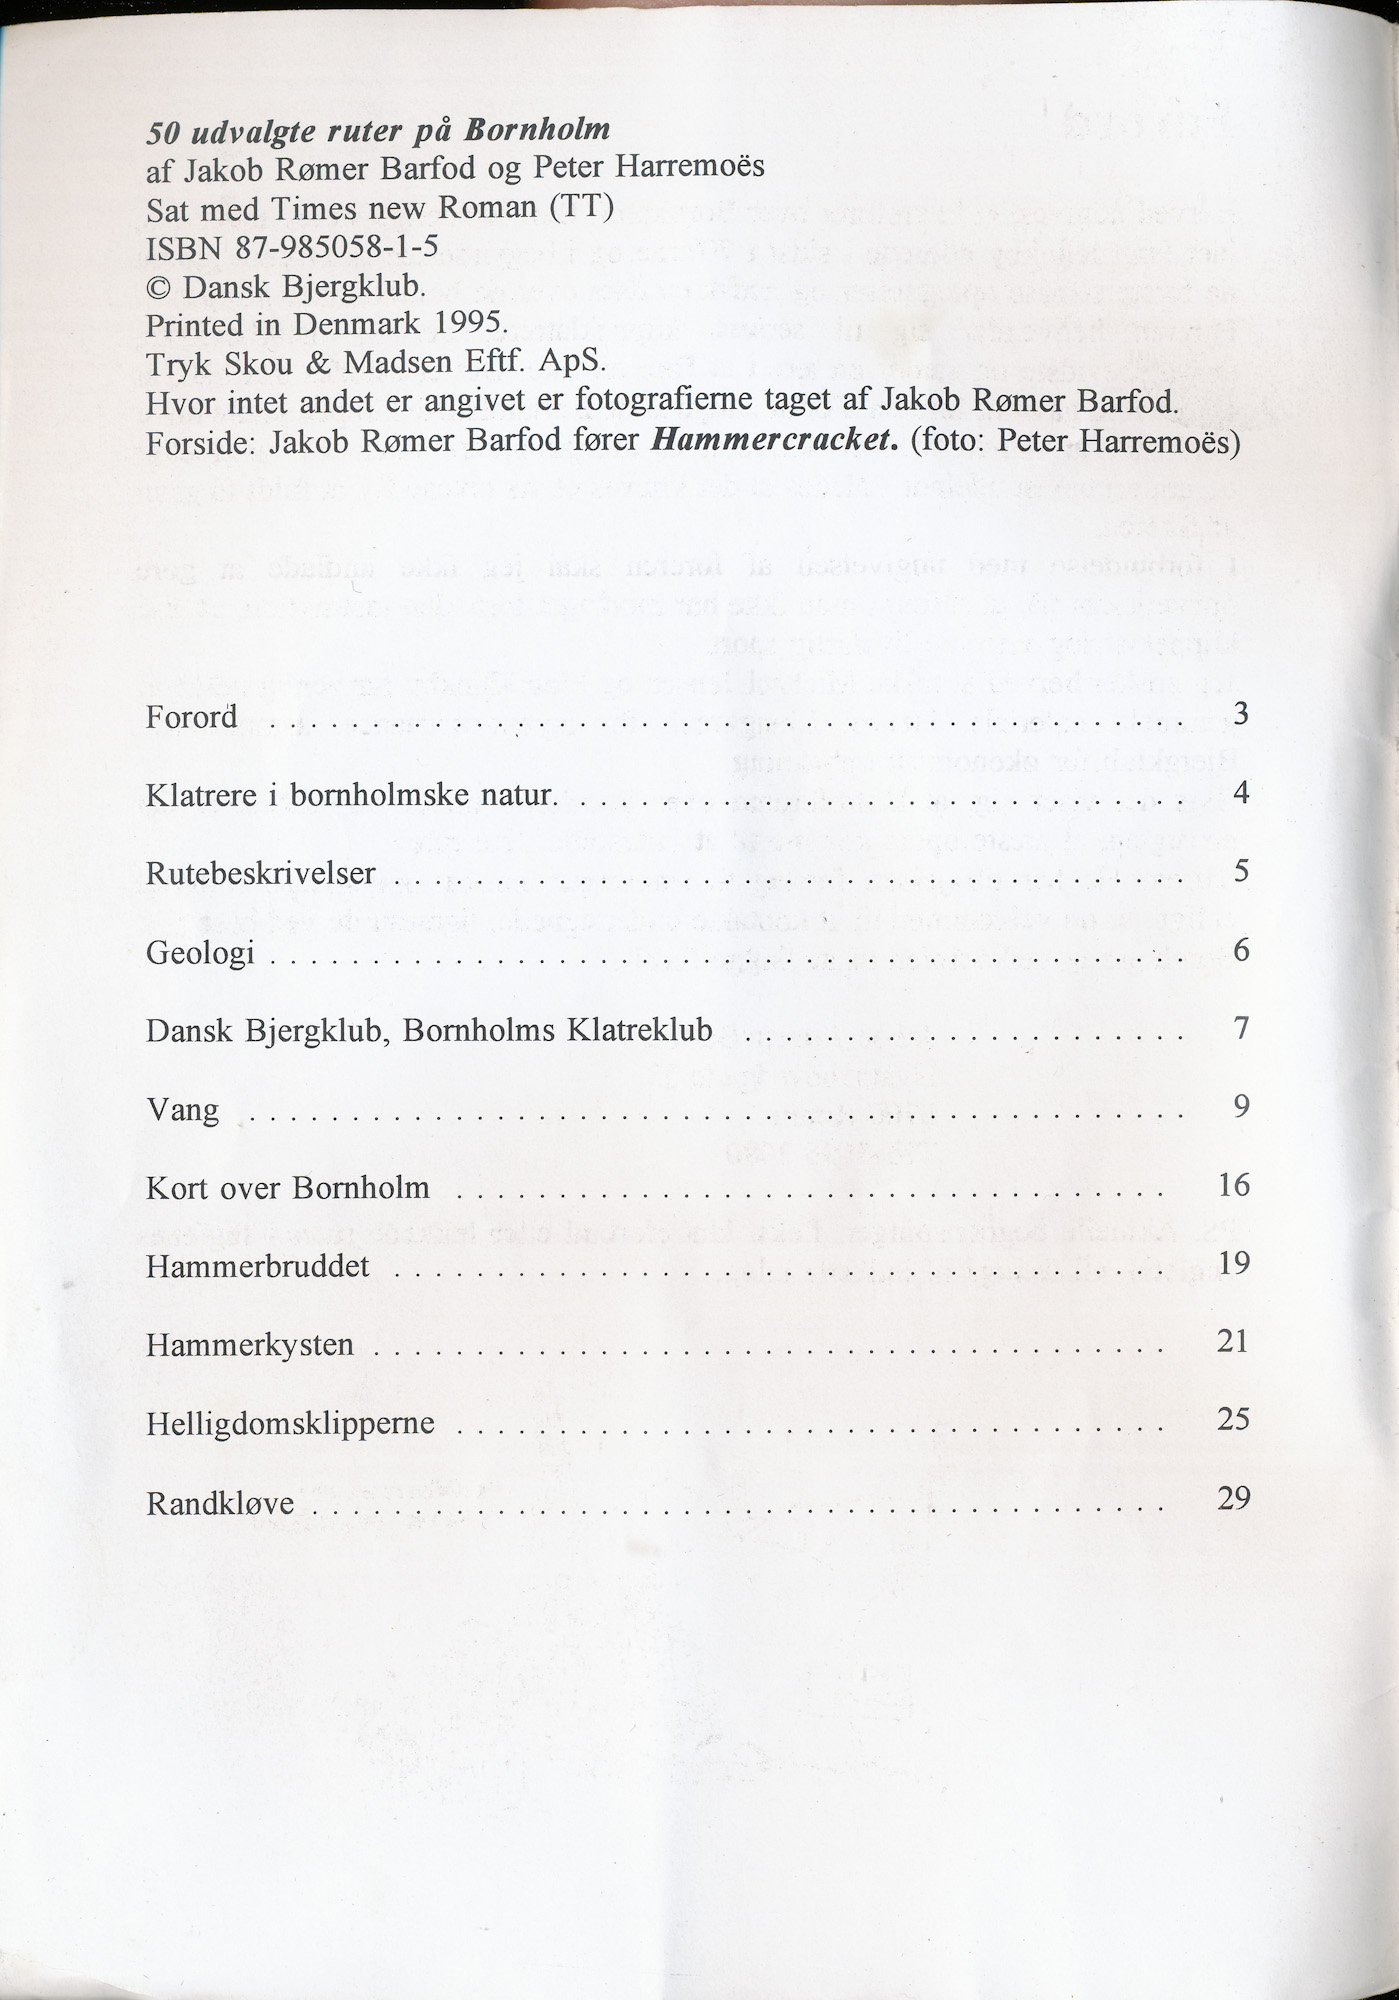 50 udvalgte ruter paa bornholm 1995 02.jpg